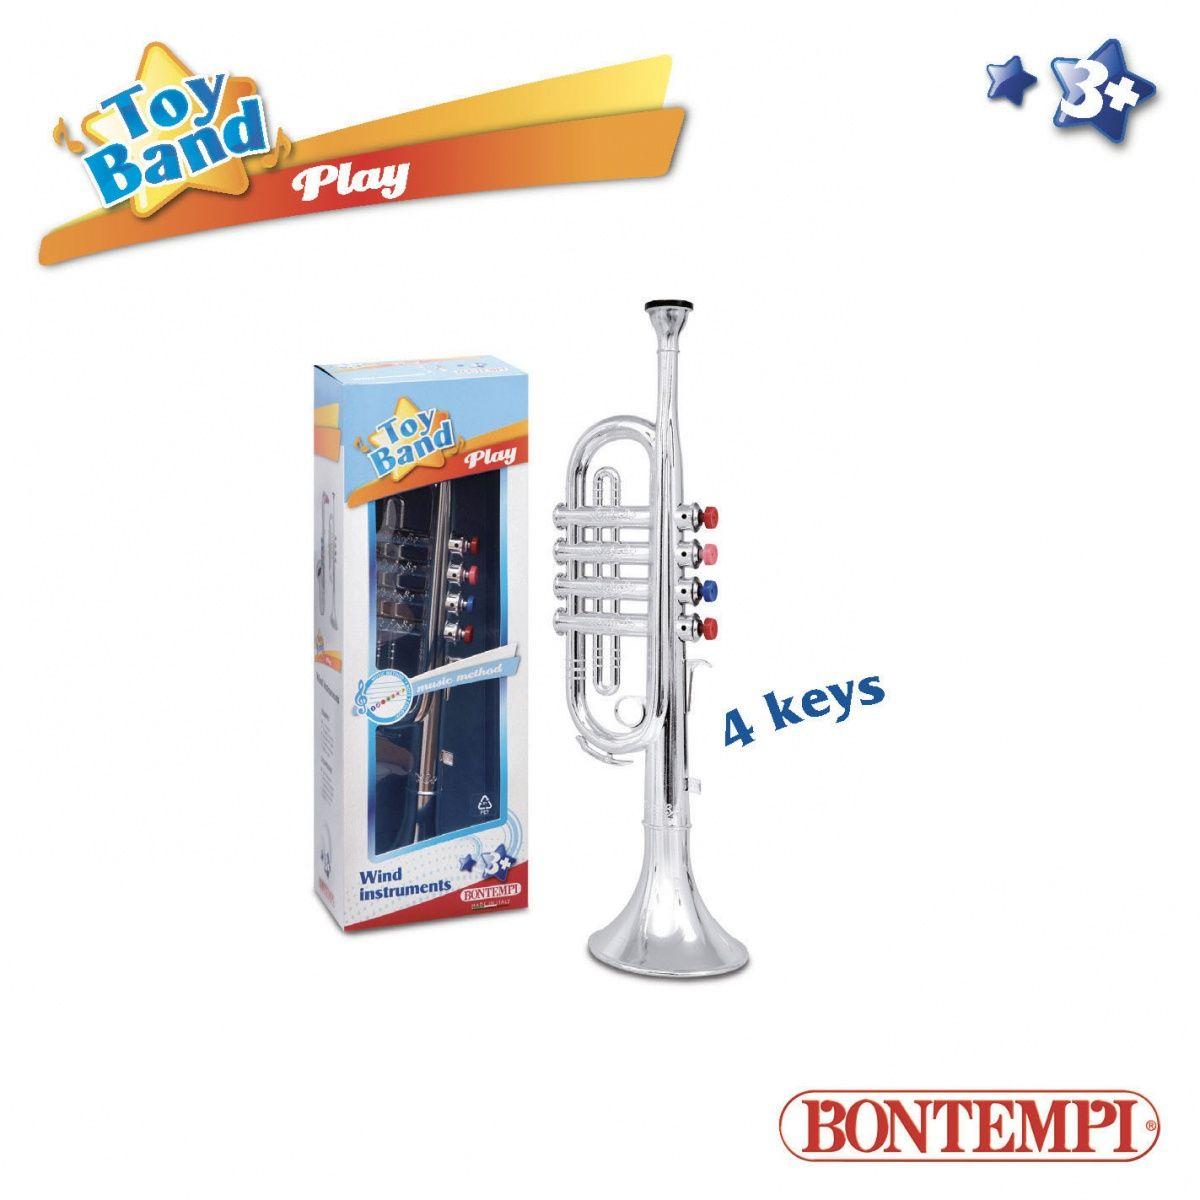 Dante Bontempi Play Silver Trumpet (041-14447) 041-14447